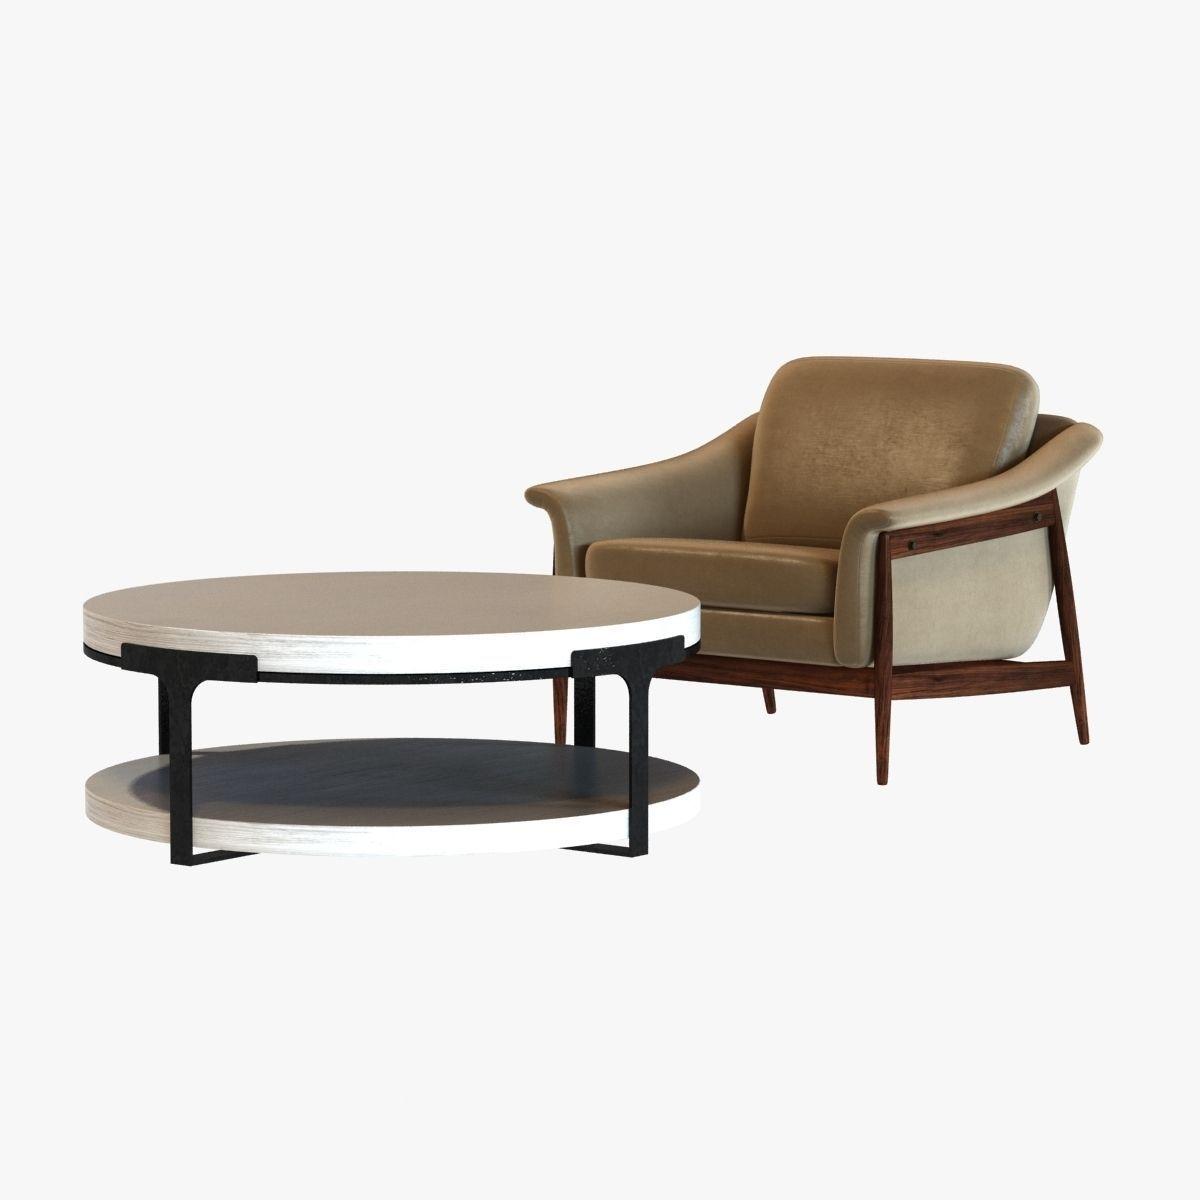 Danish Modern Club Chair And Holly Hunt Tudor Coctail Table 3d Model Max Obj 3ds Fbx